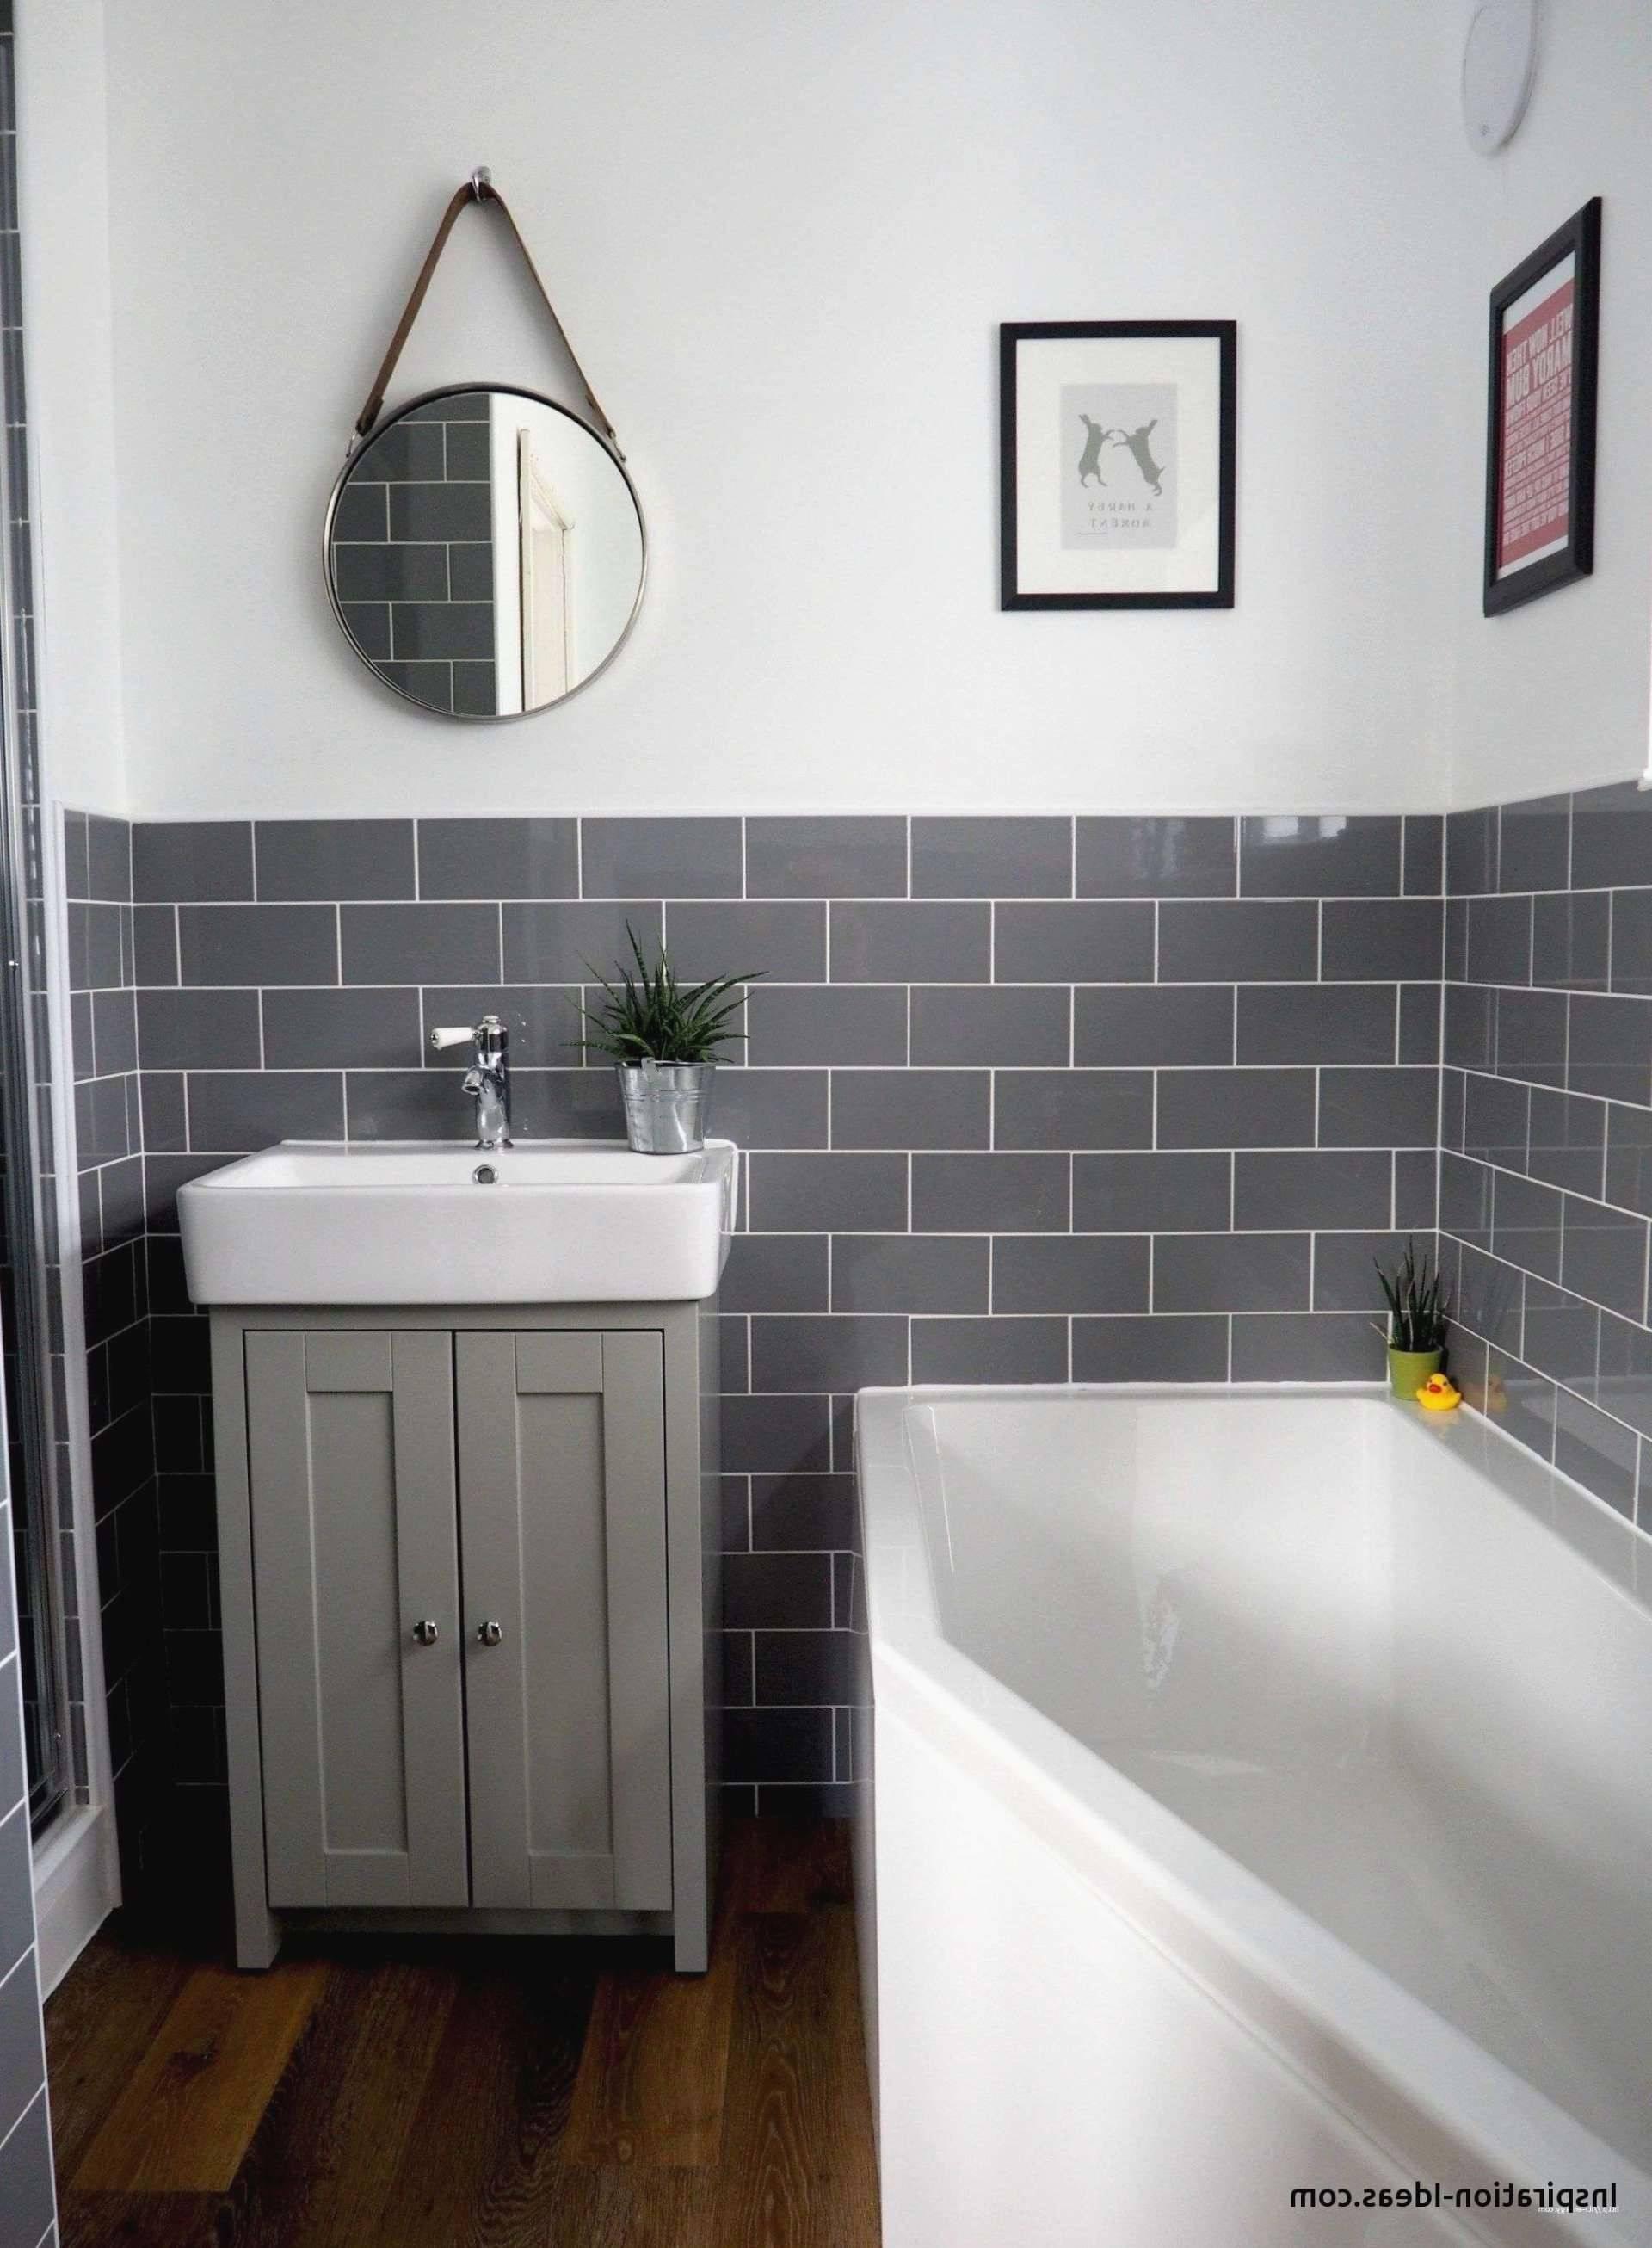 small nyc apartment bathroom ideas awesome small bathroom entry door ideas maxwebshop of small nyc apartment bathroom ideas